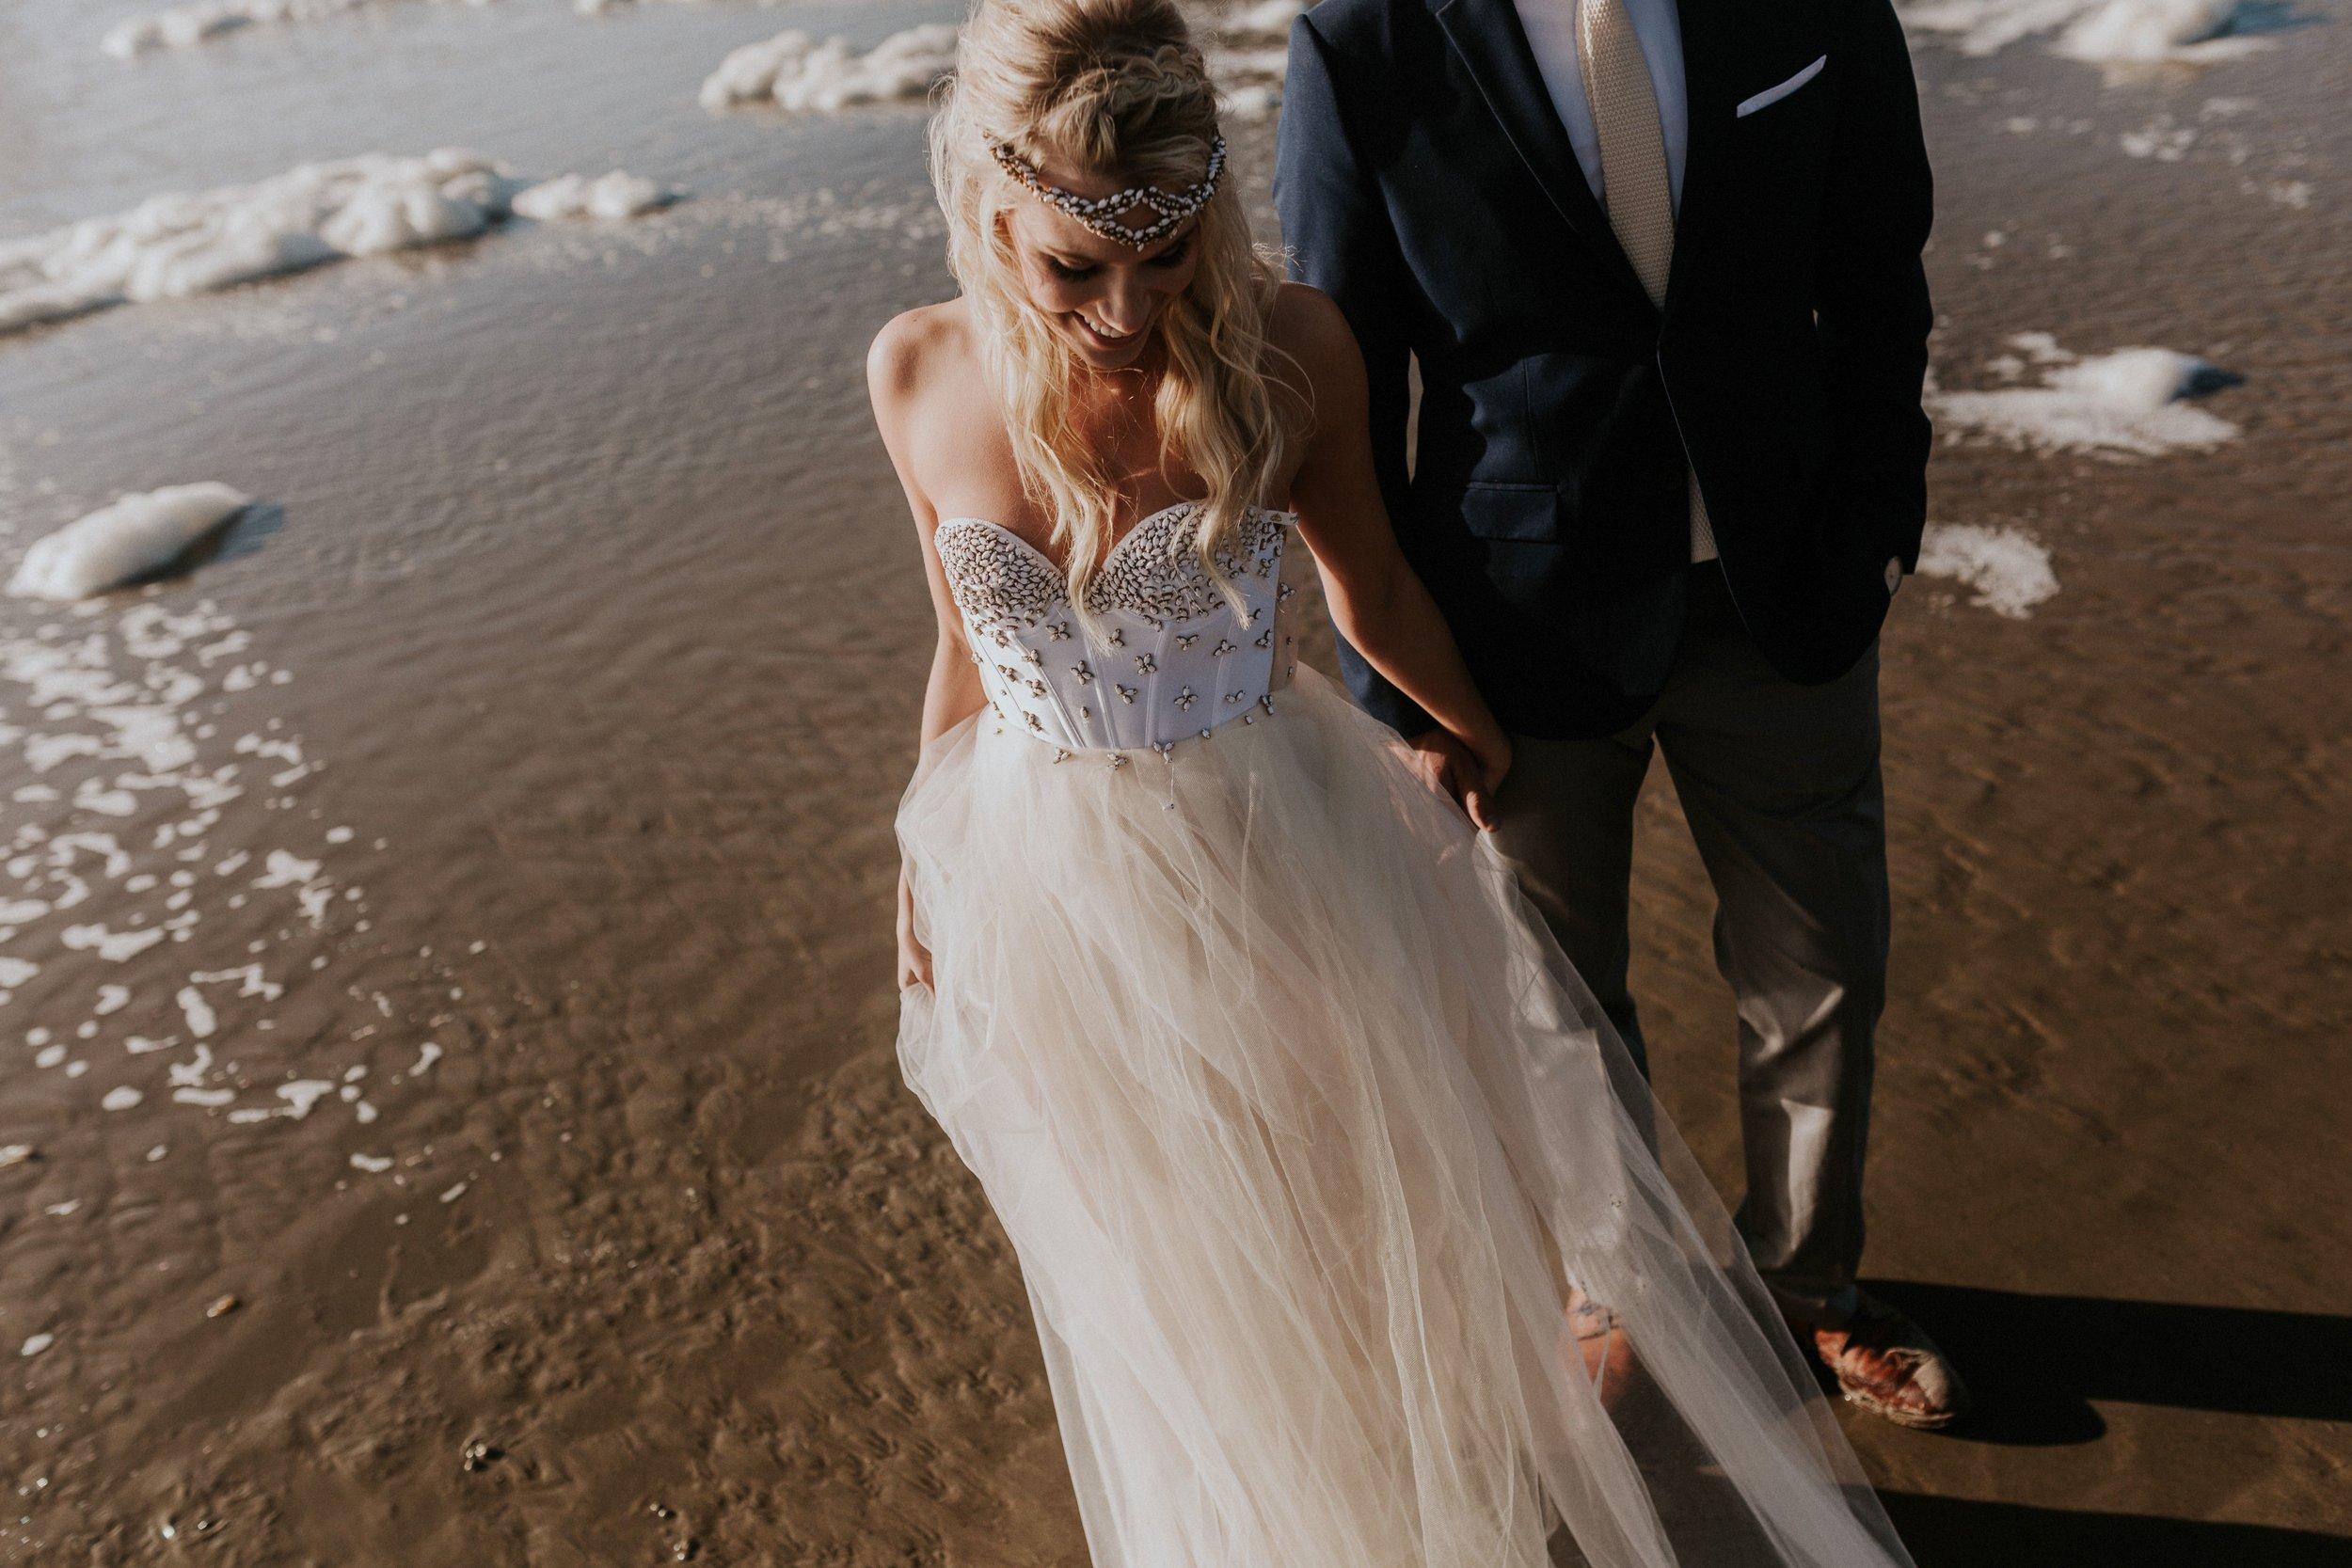 Cannon Beach Oregon Elopement- Grace and Jaden Photography (15)(1).jpg